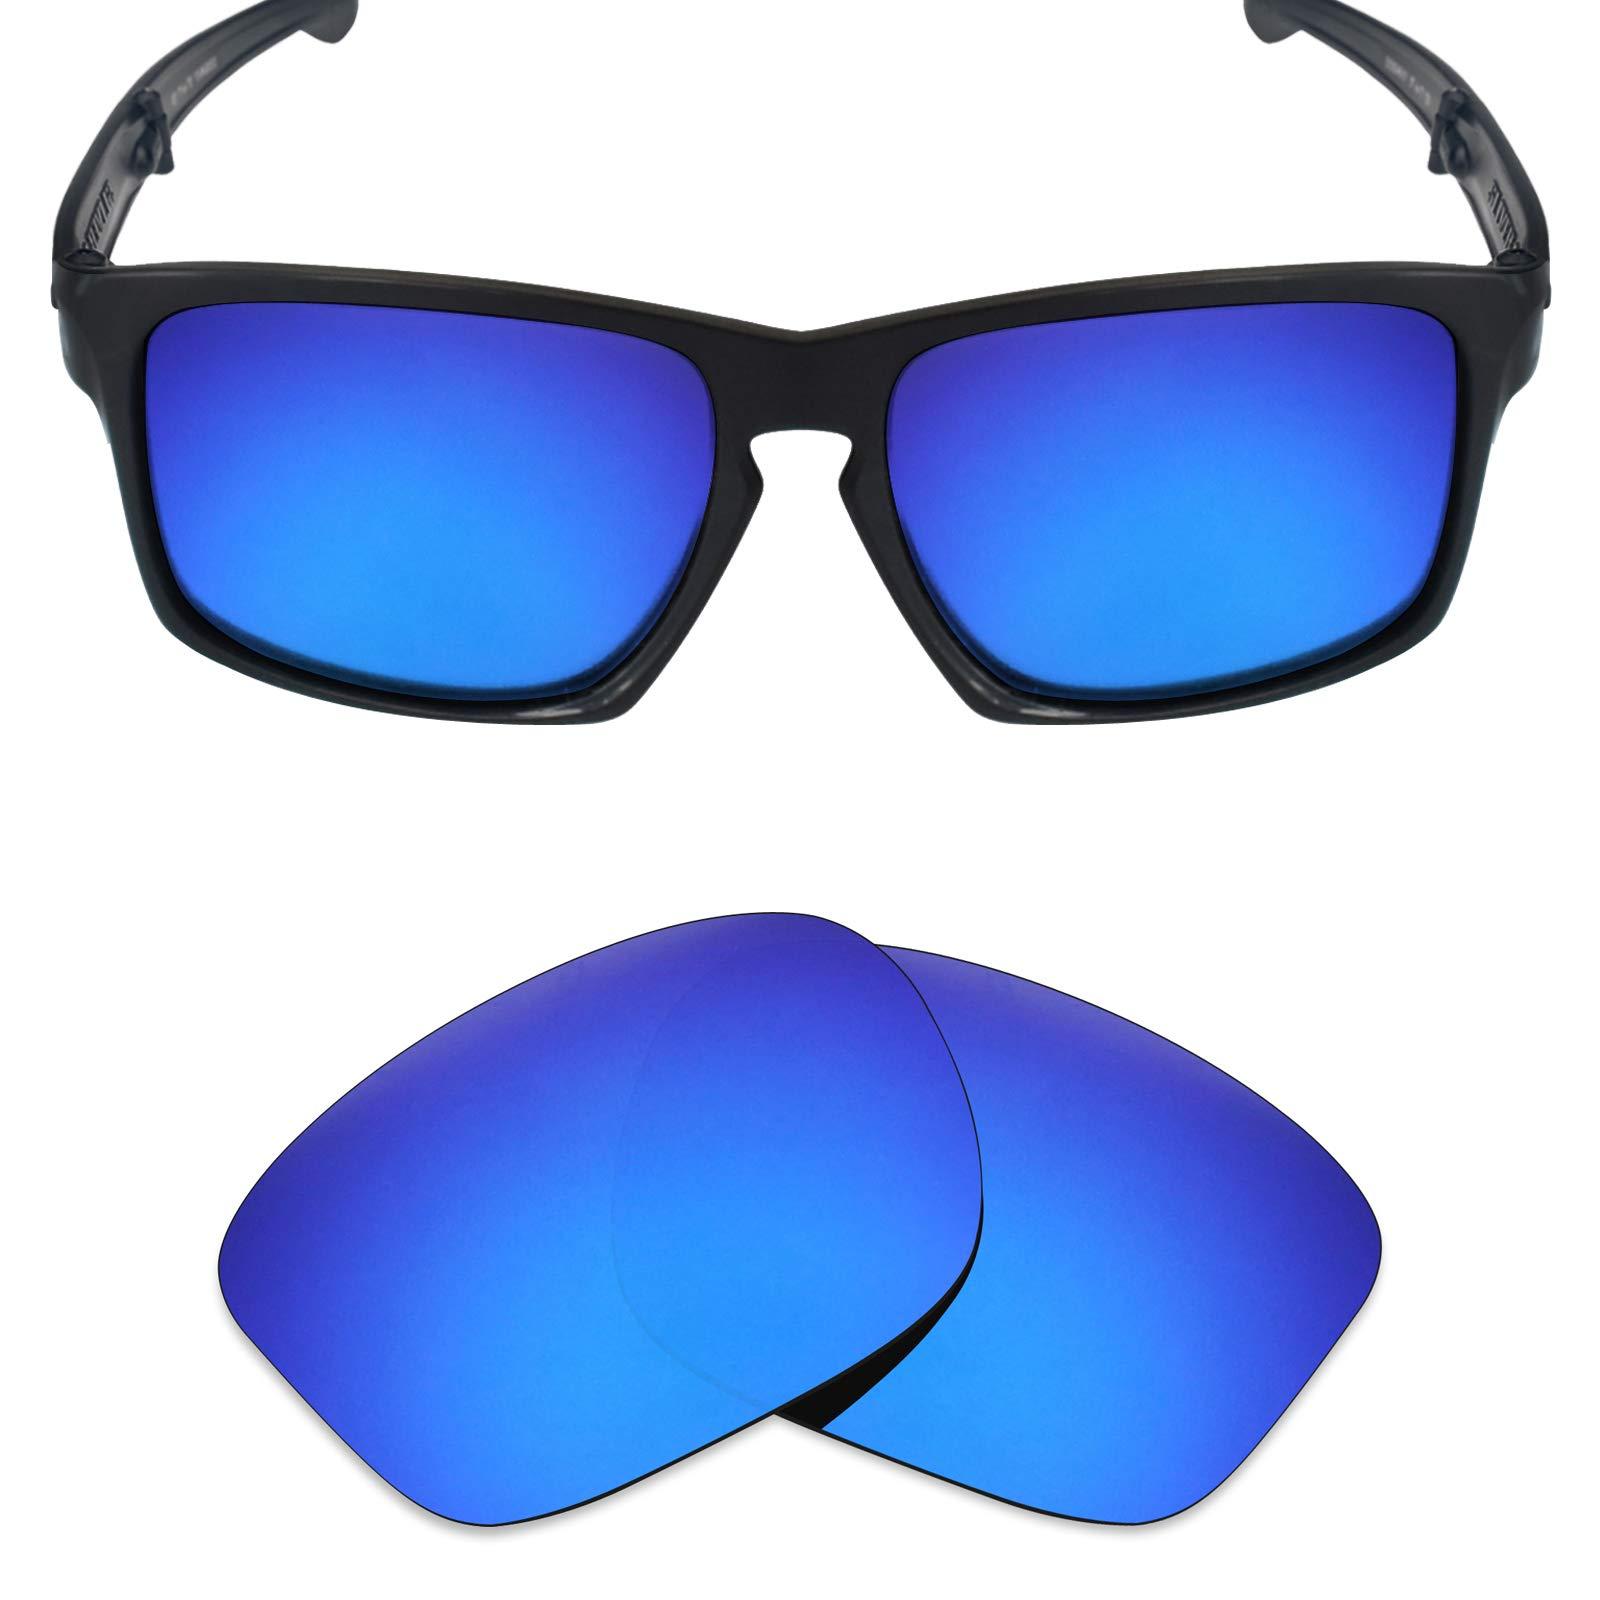 2cb576c40 Mryok Polarized Replacement Lenses for Oakley Sliver F Folding - Deep Blue